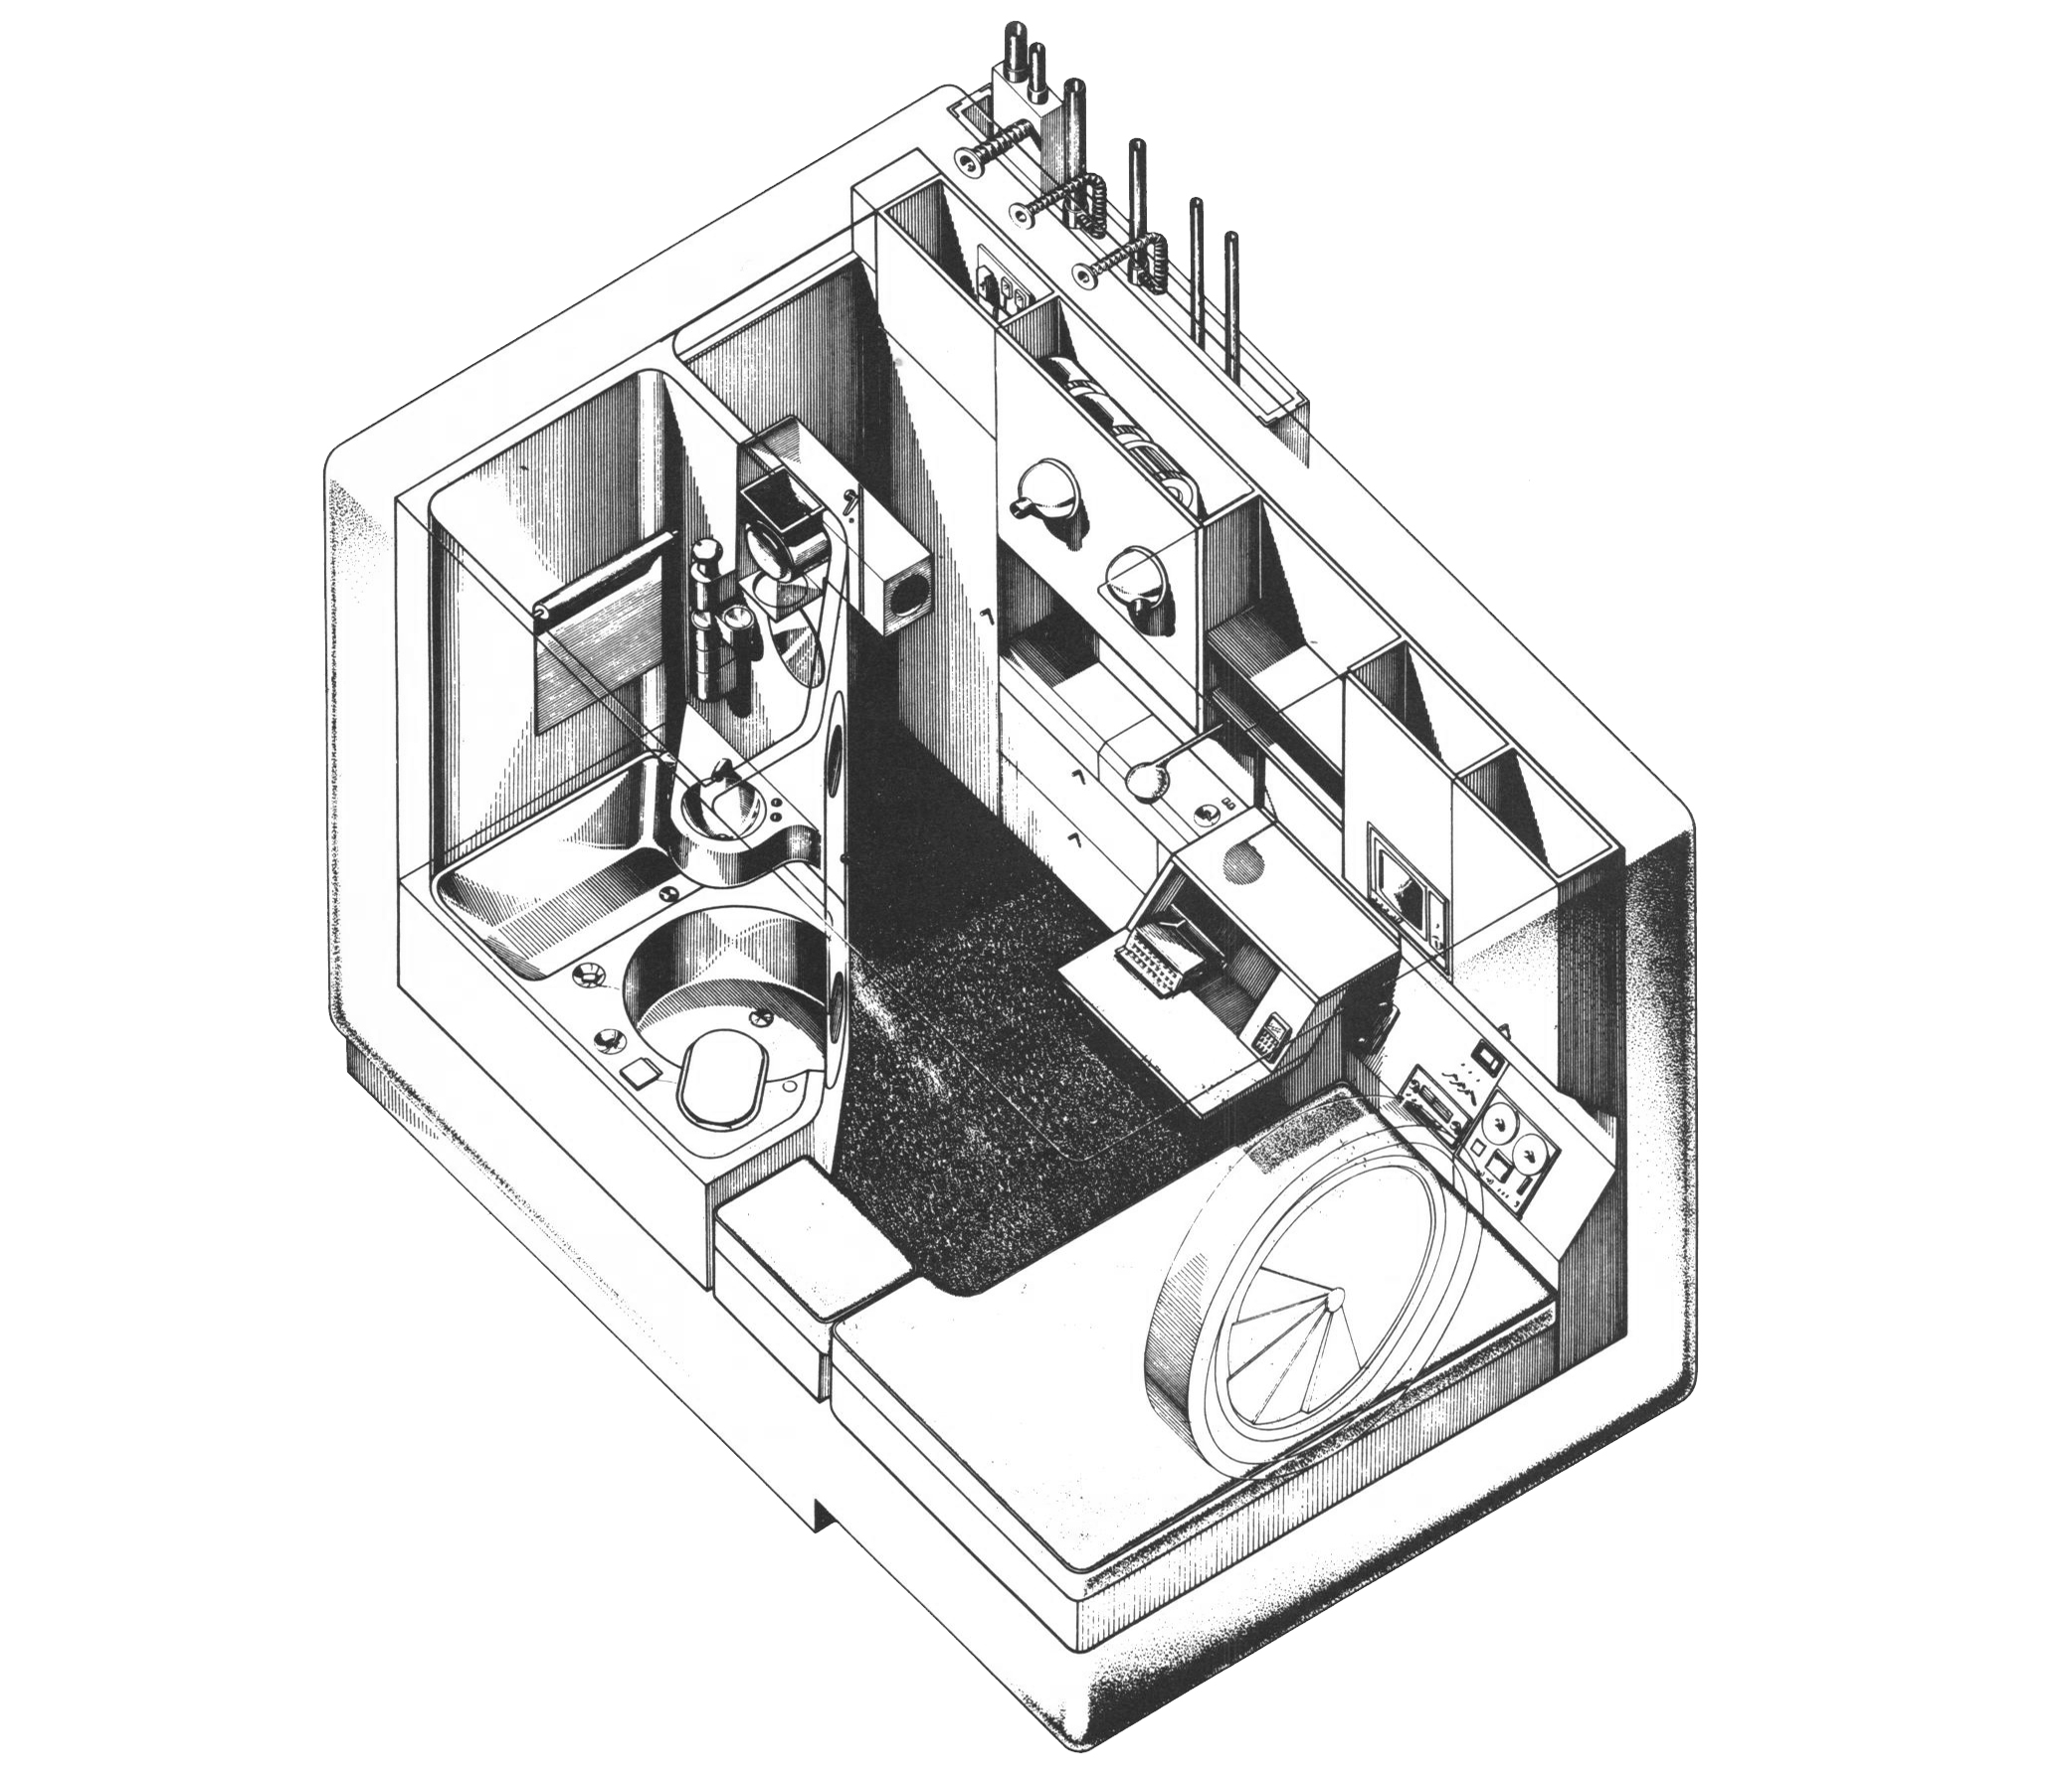 (  Kisho Kurokawa: From Metabolism and Symbiosis)  Nagakin Capsule Tower (1972)